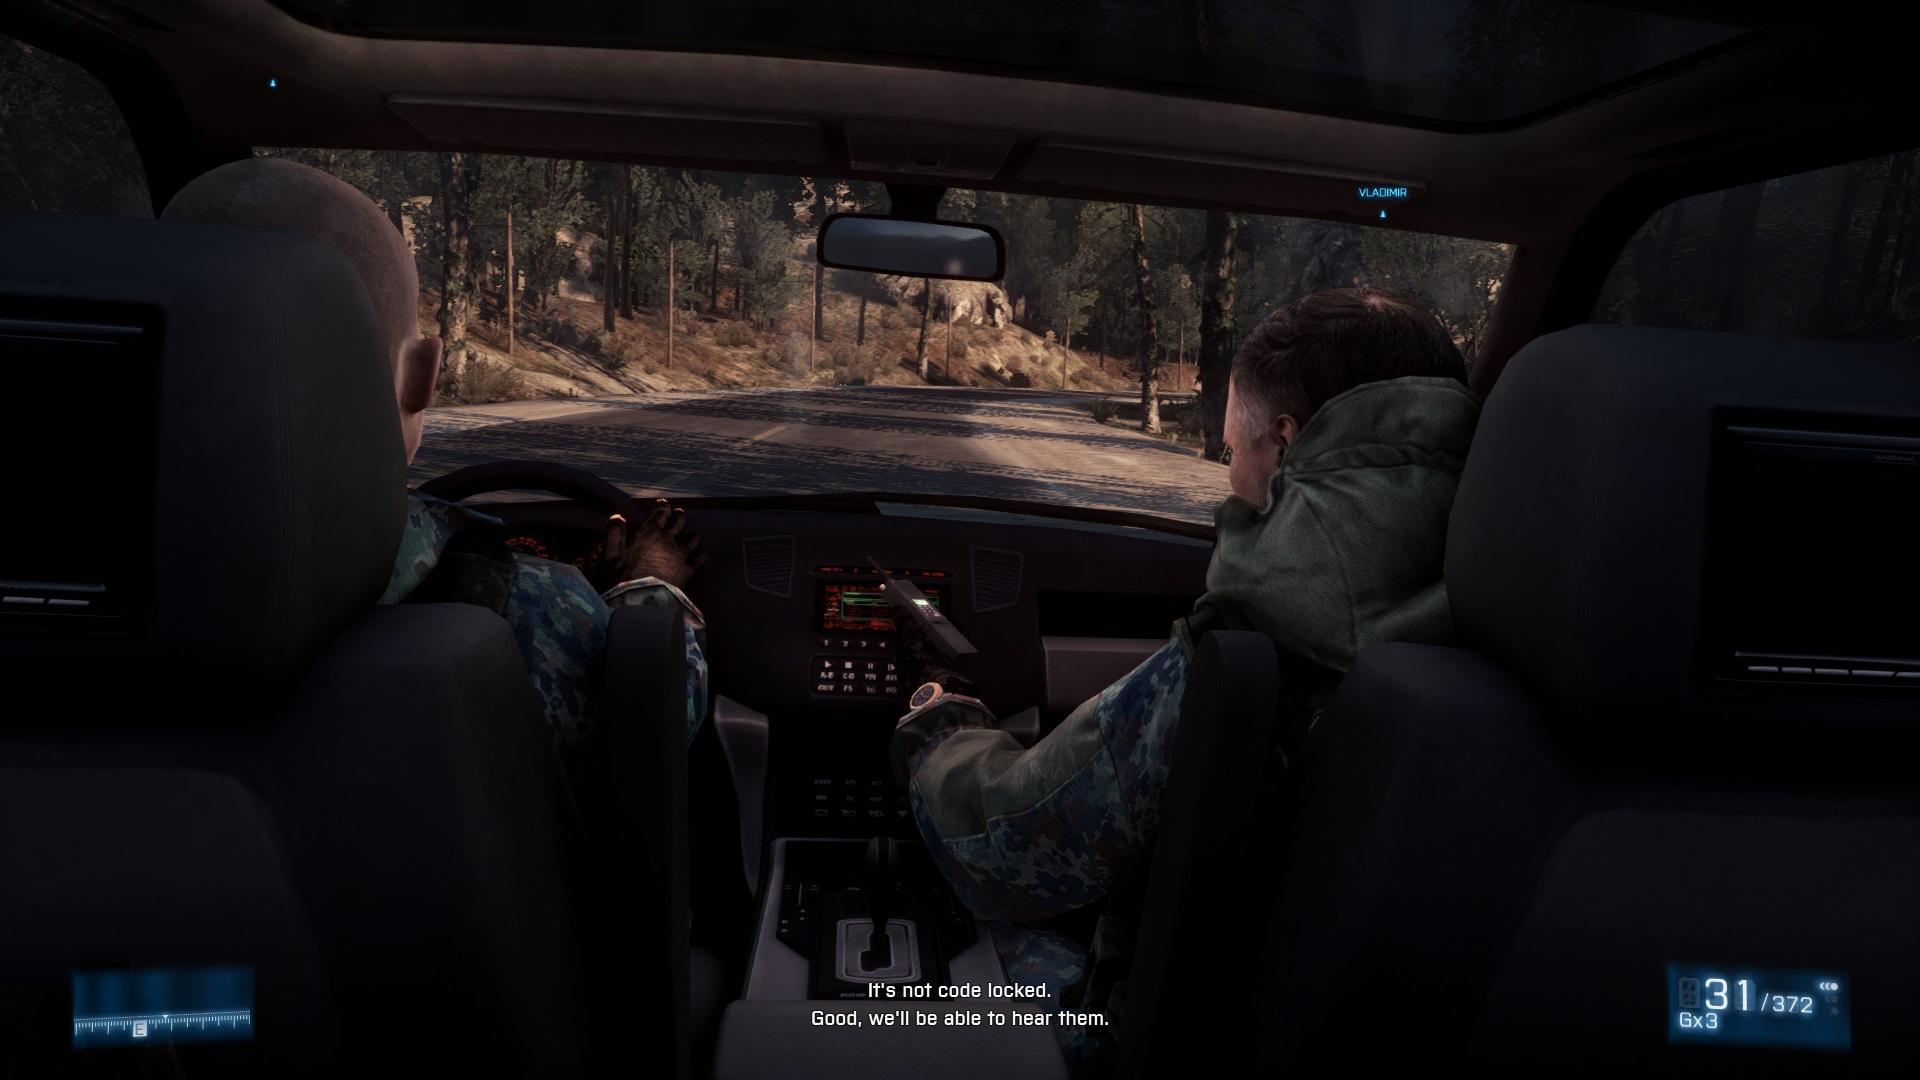 Best Recon Loadout Bf3 Screenshotwin